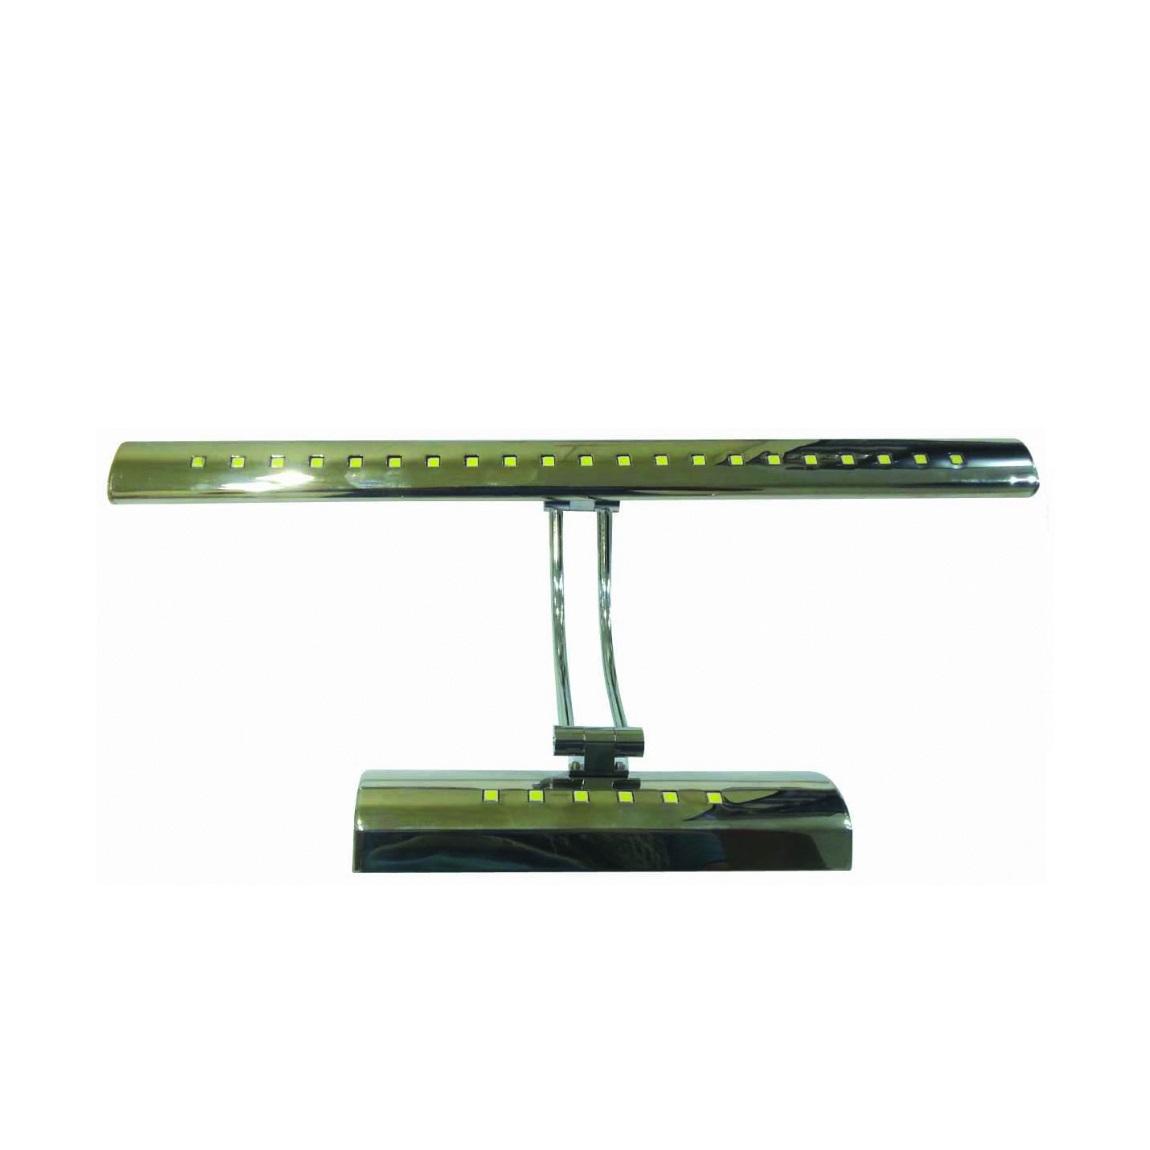 K2 GLOBAL KSL152 - LED Resim Apliği